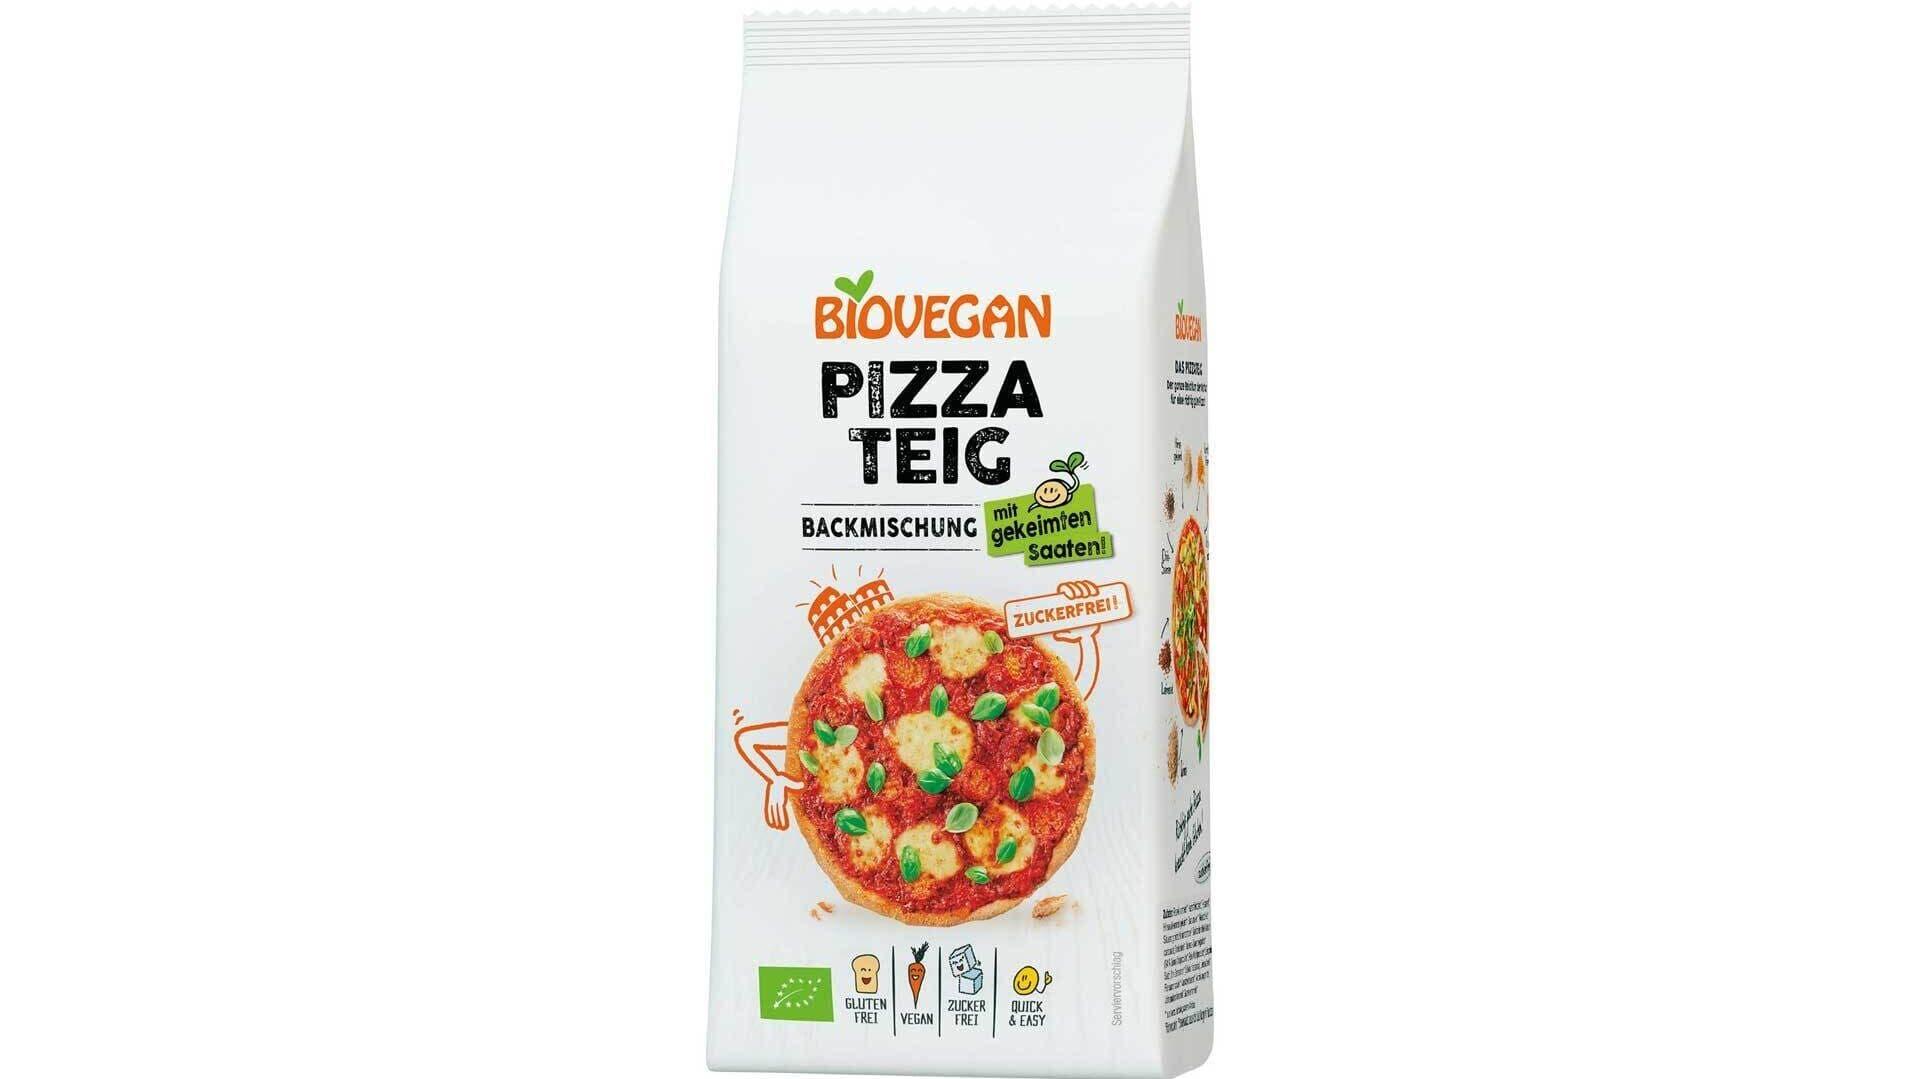 Biovegan Pizzateig